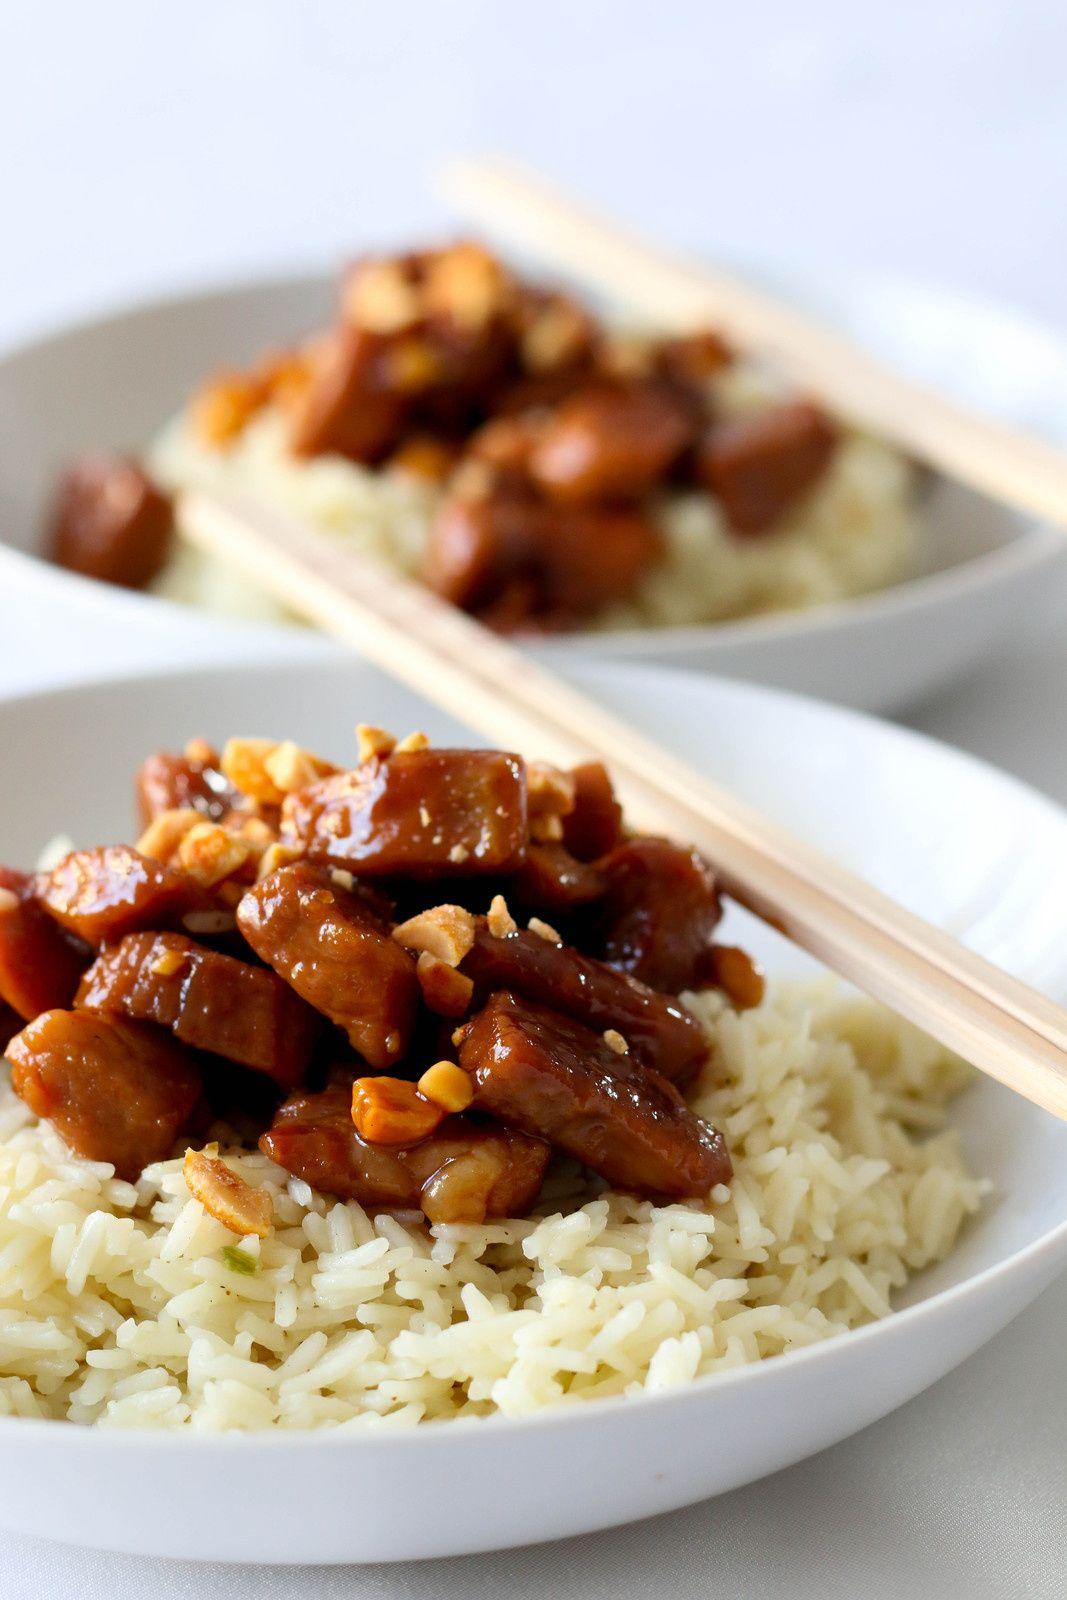 Porc au caramel asie porc restaurant et cuisine for Cuisine asiatique